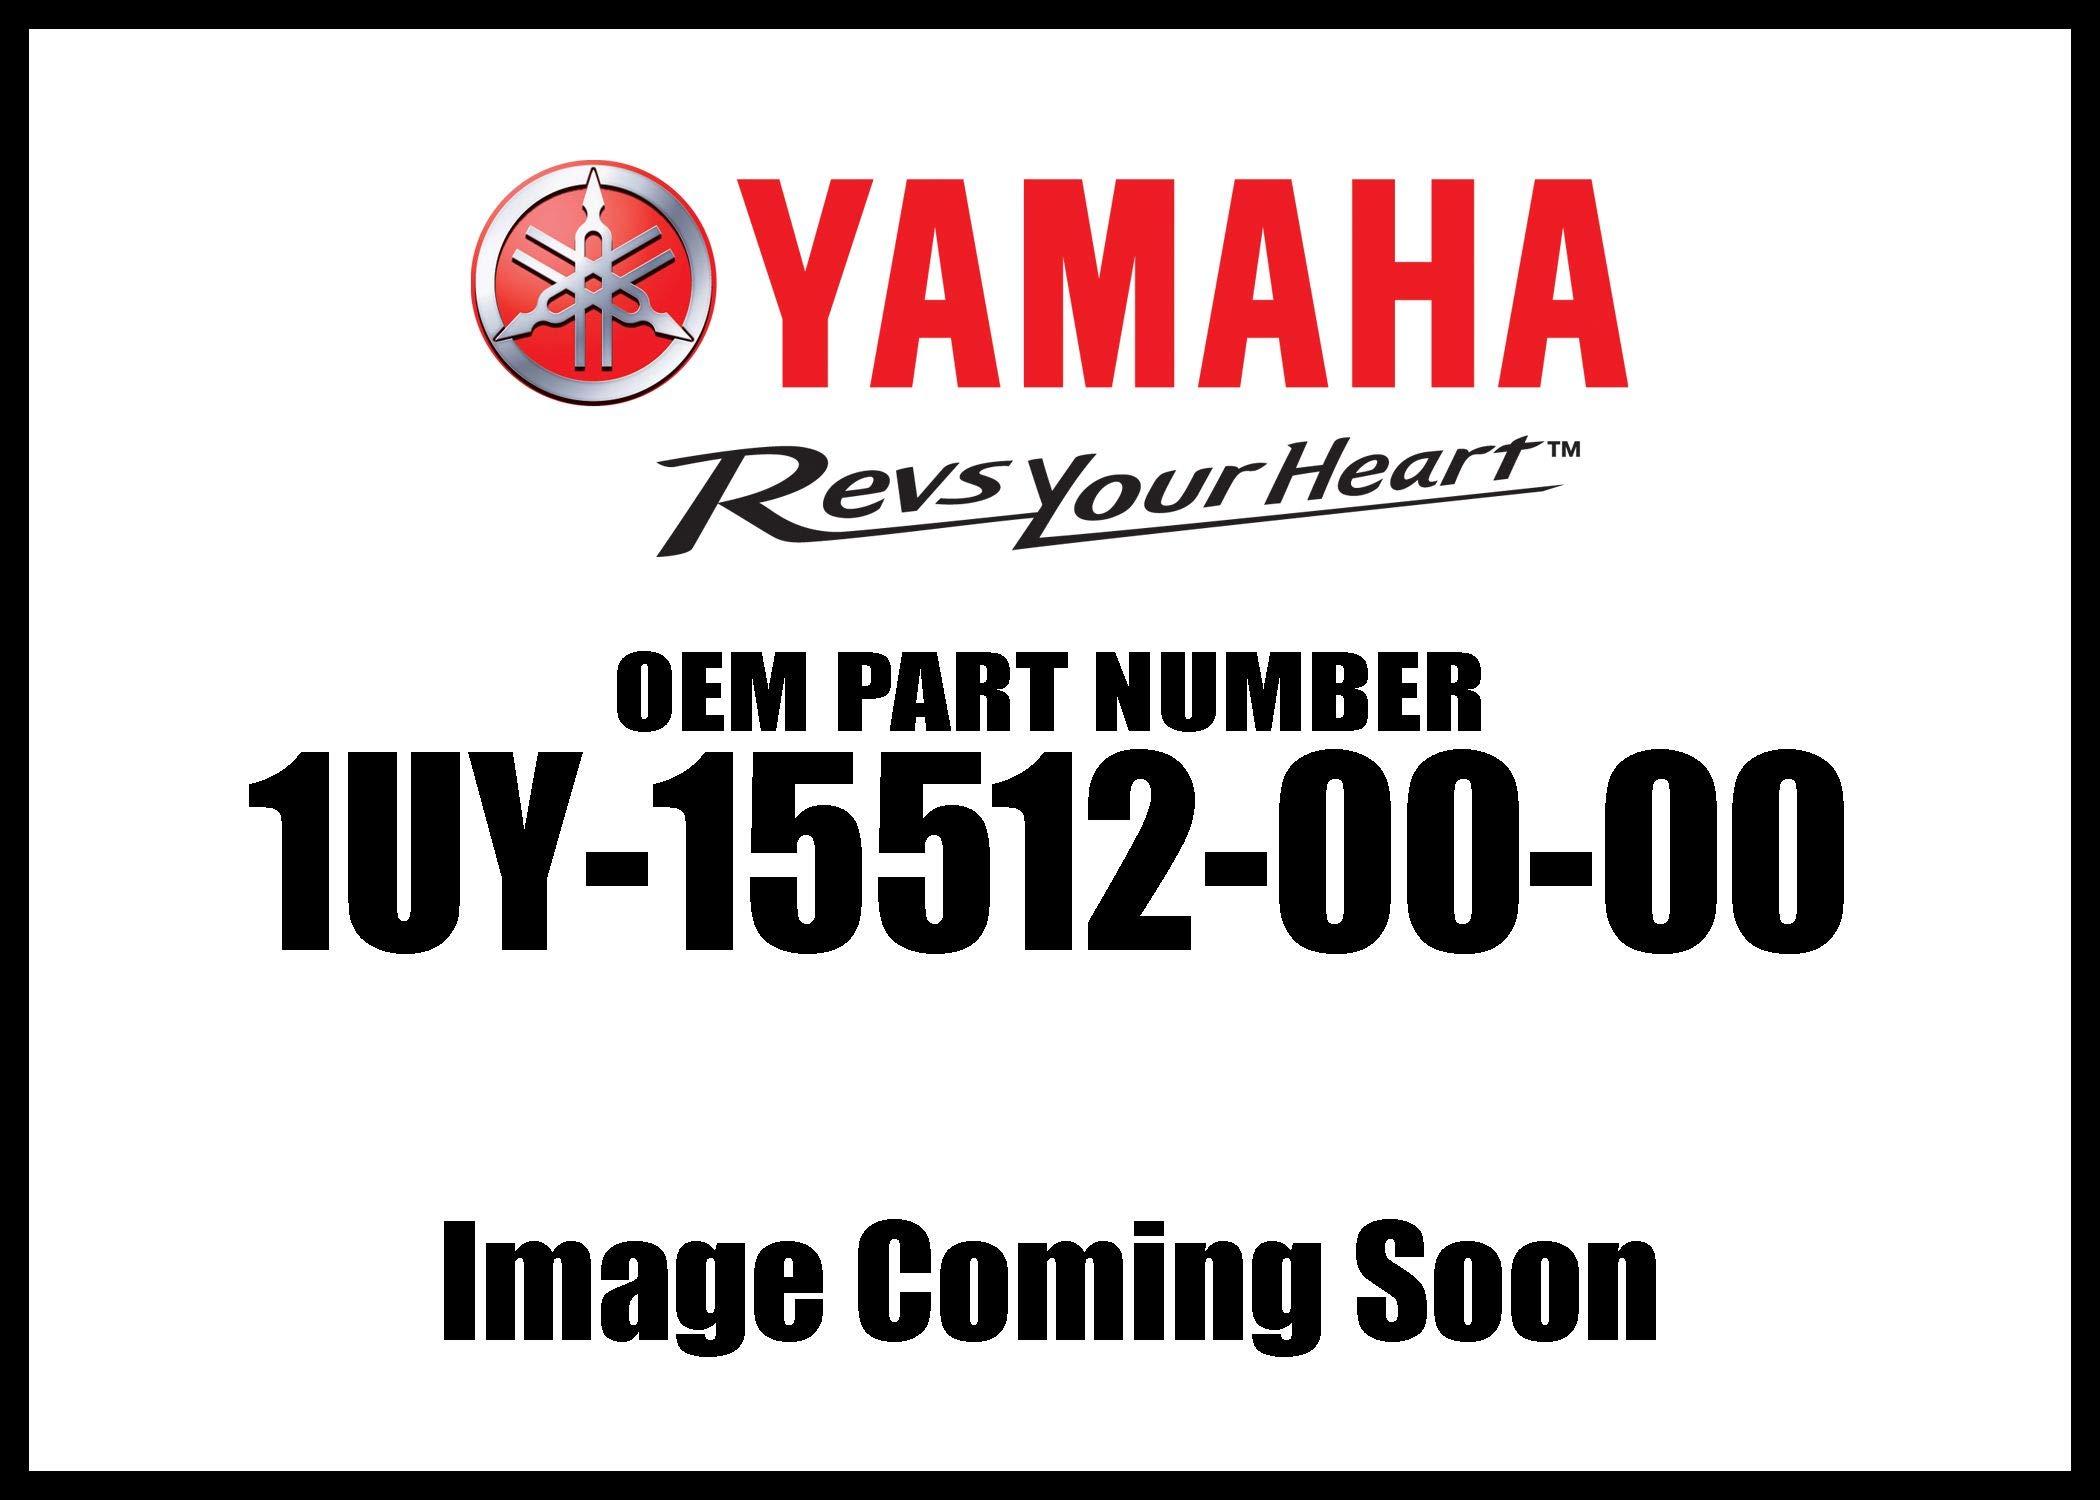 Yamaha 1UY155120000 Idler Gear by Yamaha (Image #1)